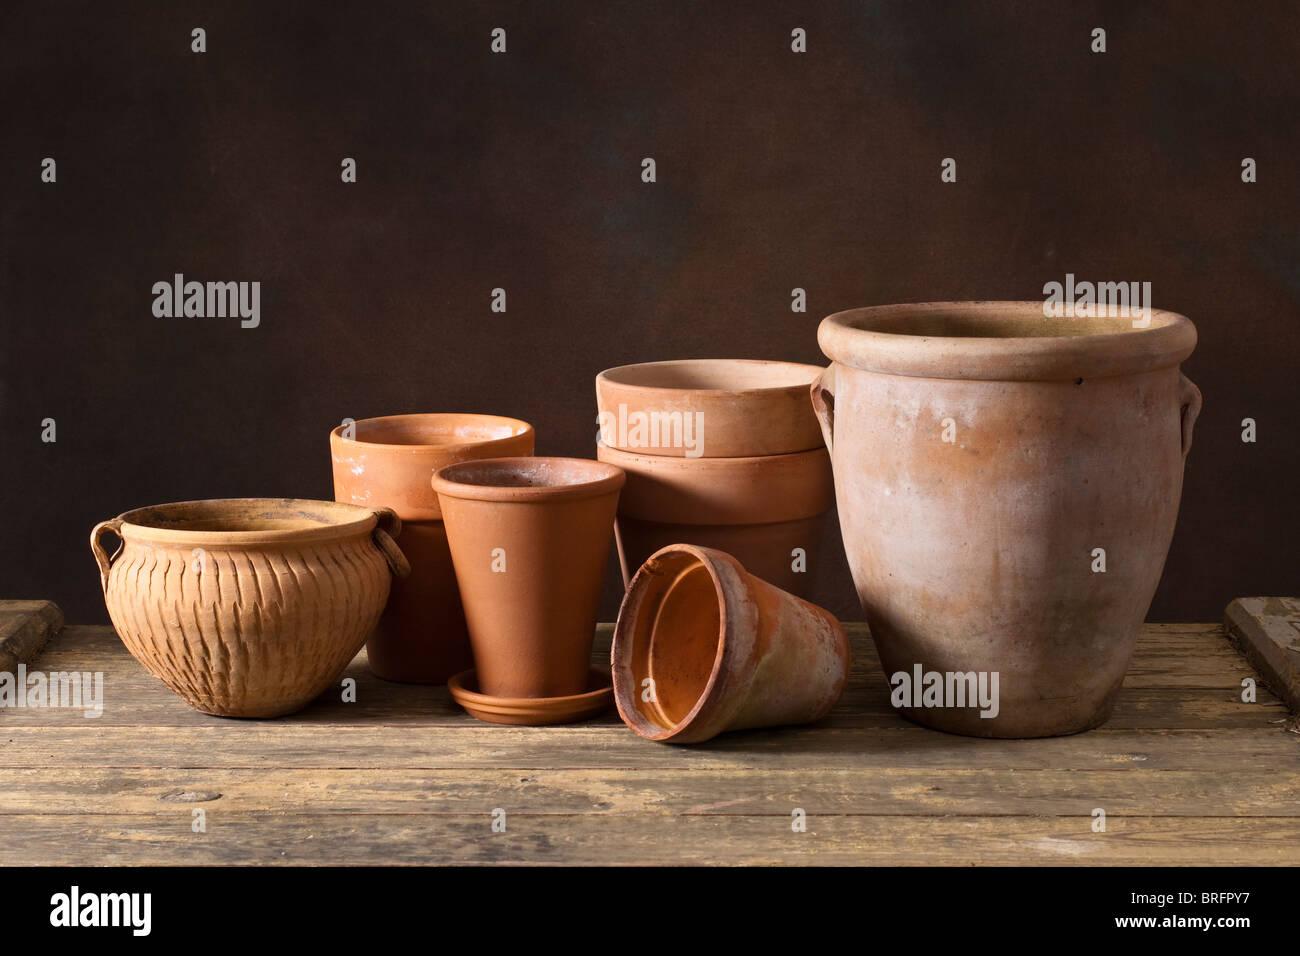 Terracotta pottery flower pots - Stock Image